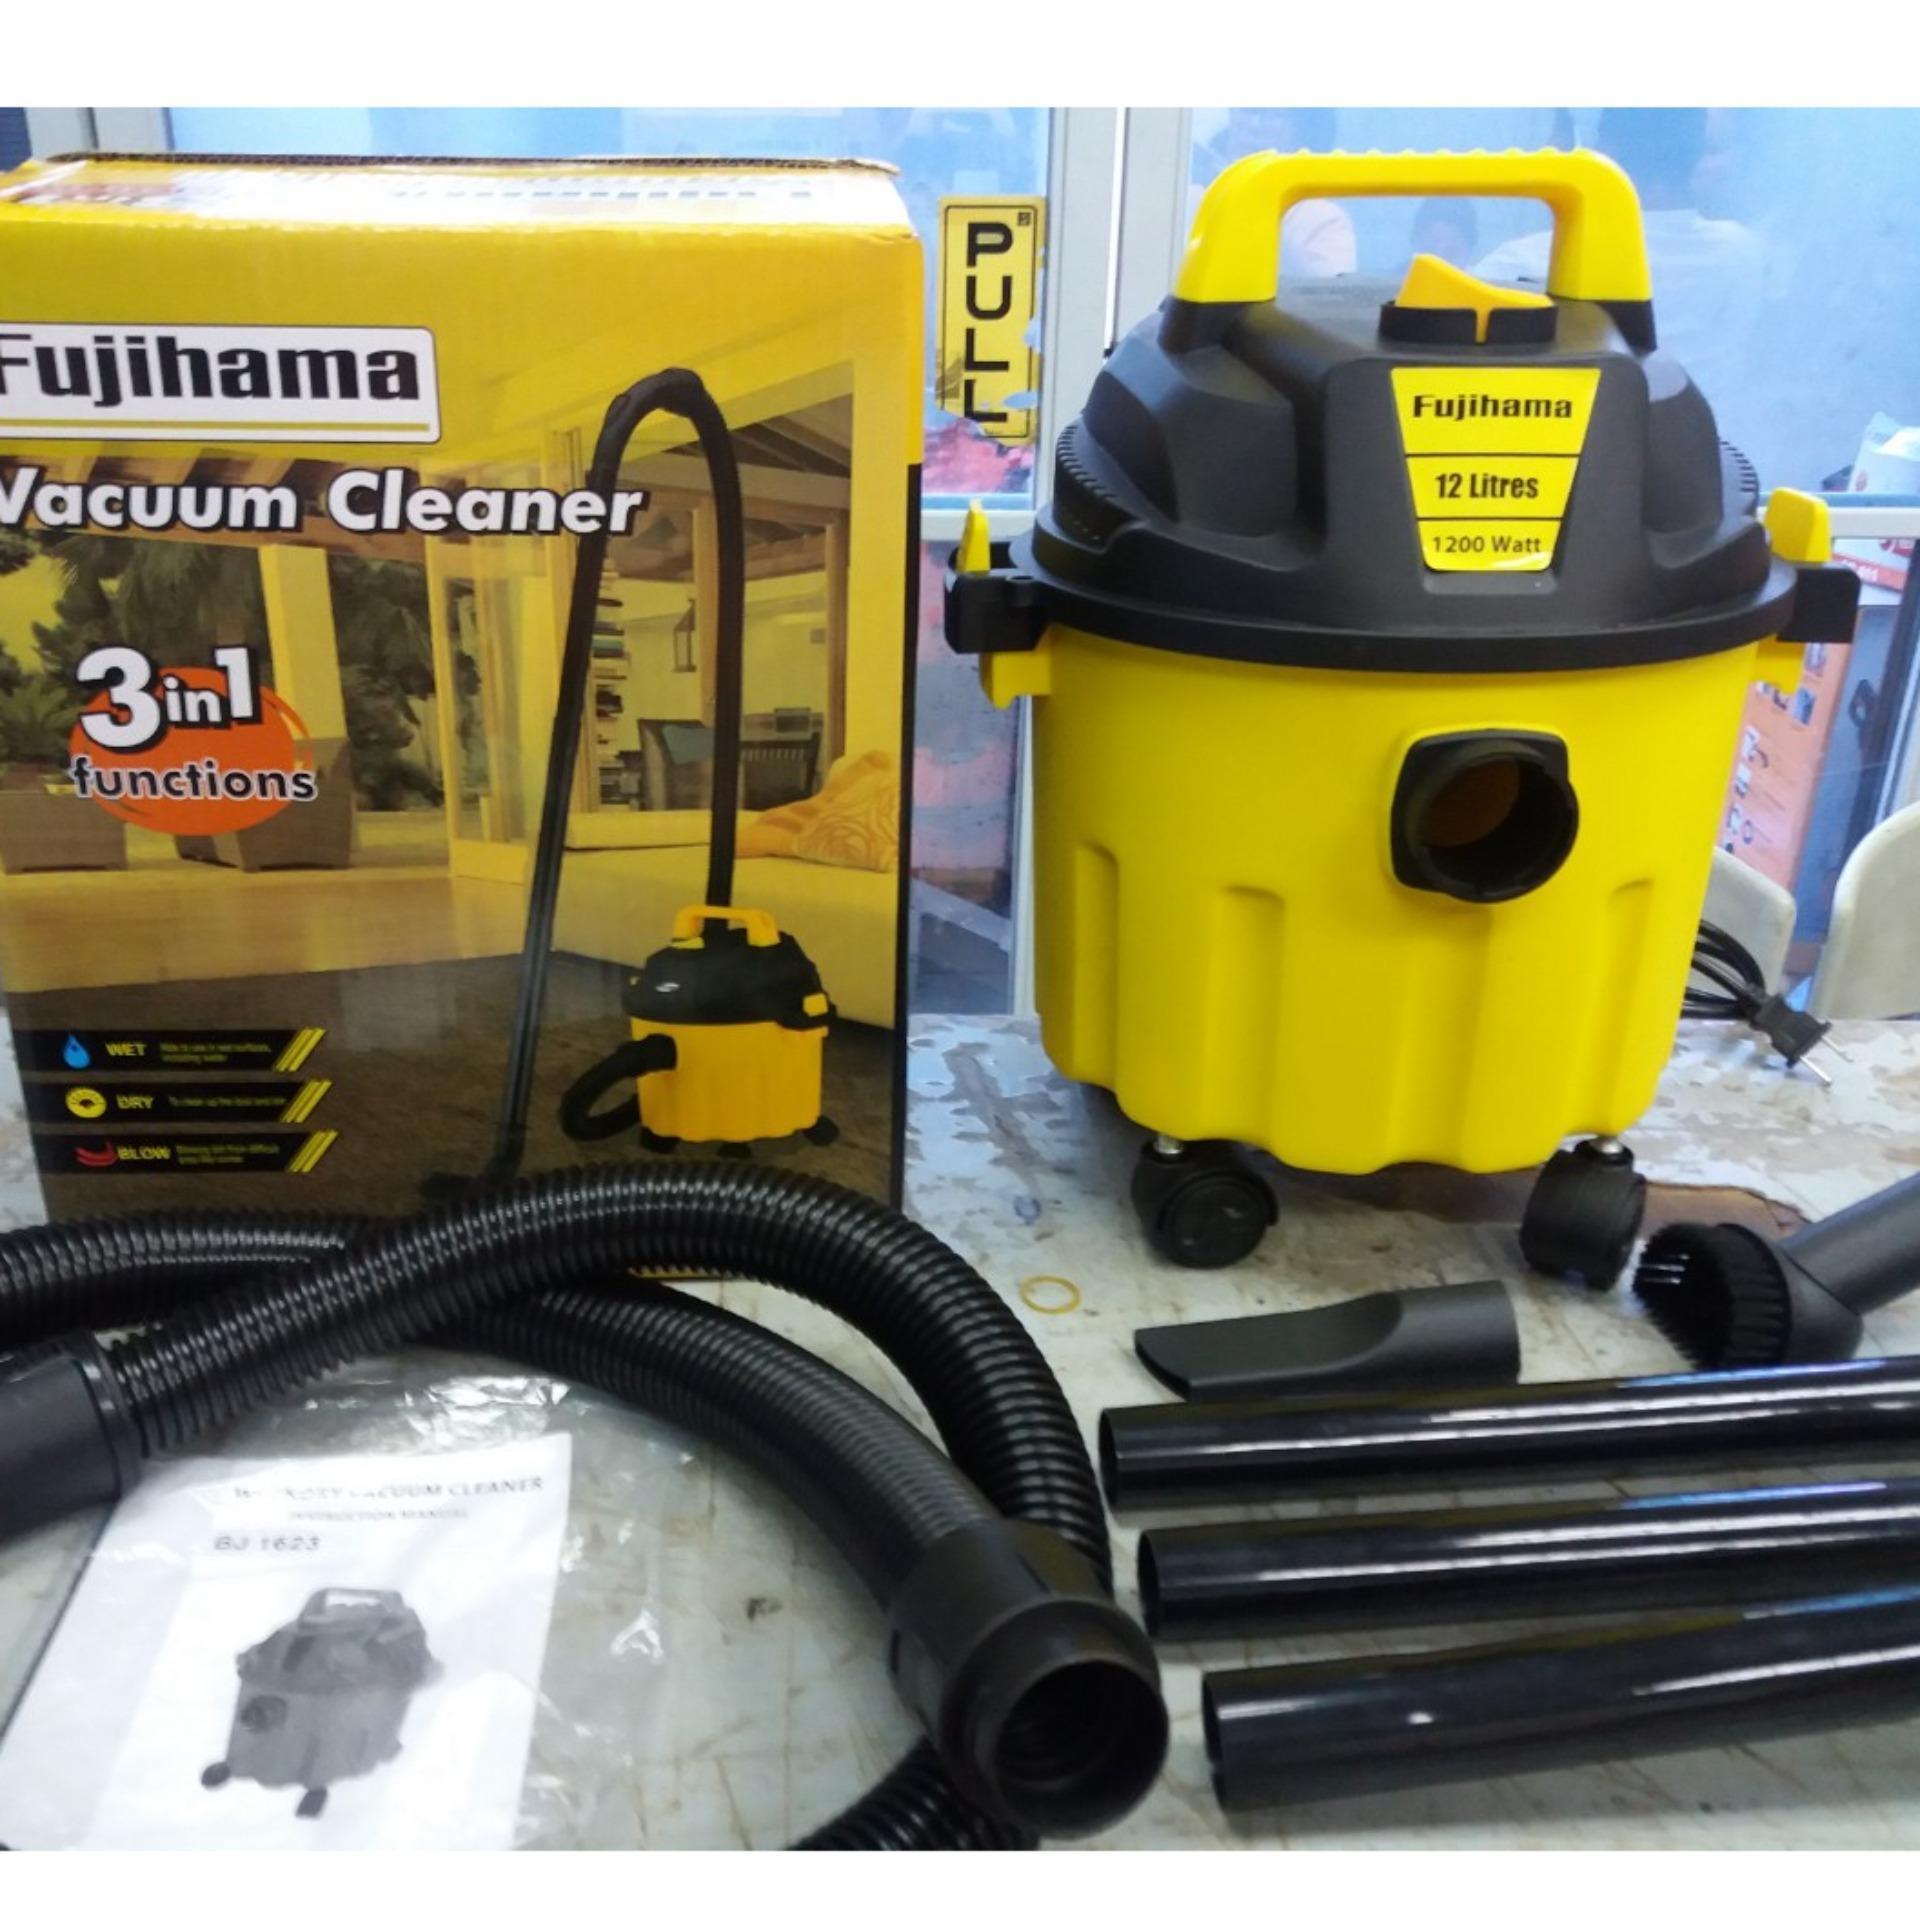 ed5f3d4c4ba Fujihama Vacuum Cleaner Wet Dry Blow 12L